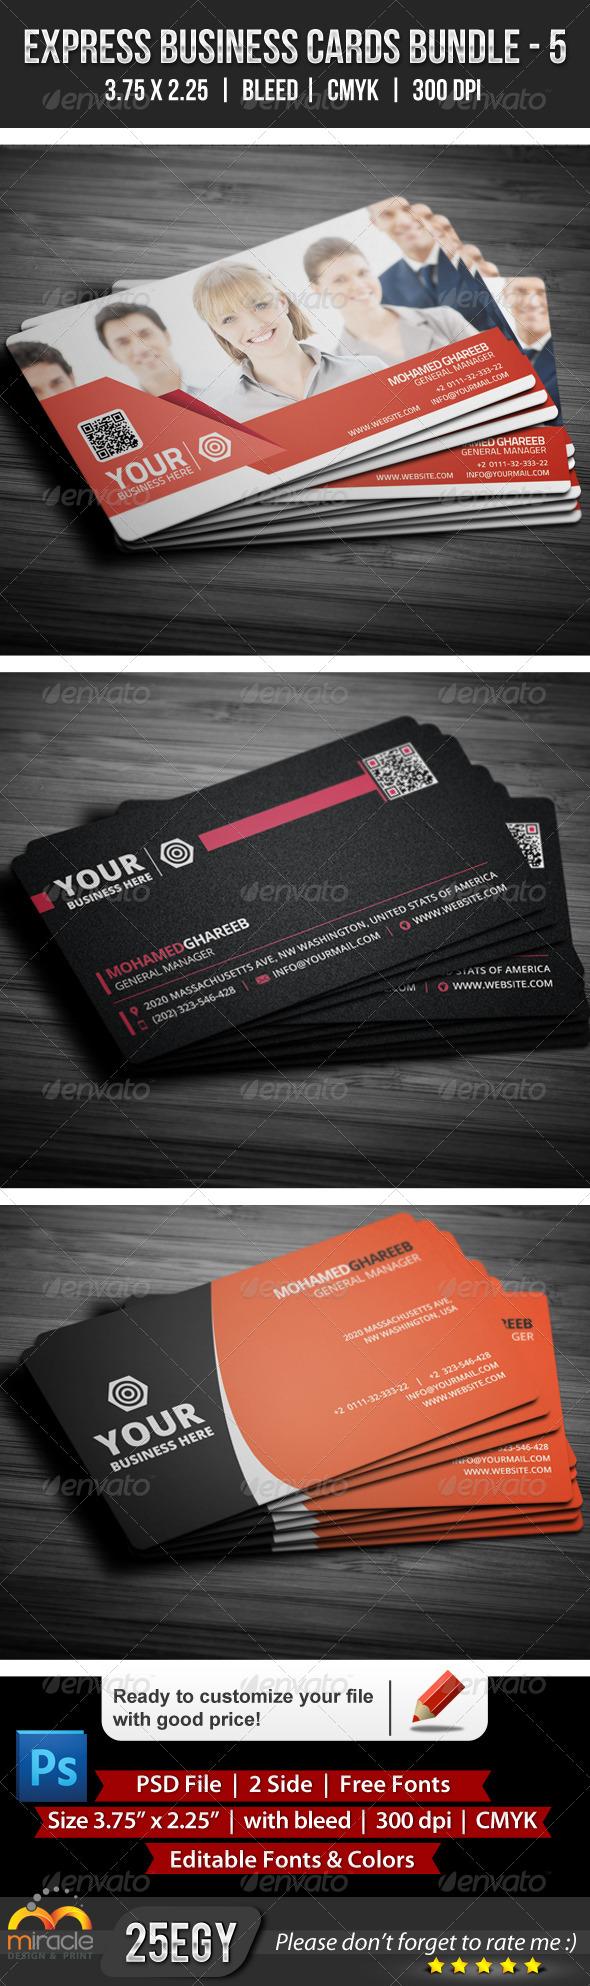 Express Business Cards Bundle 5